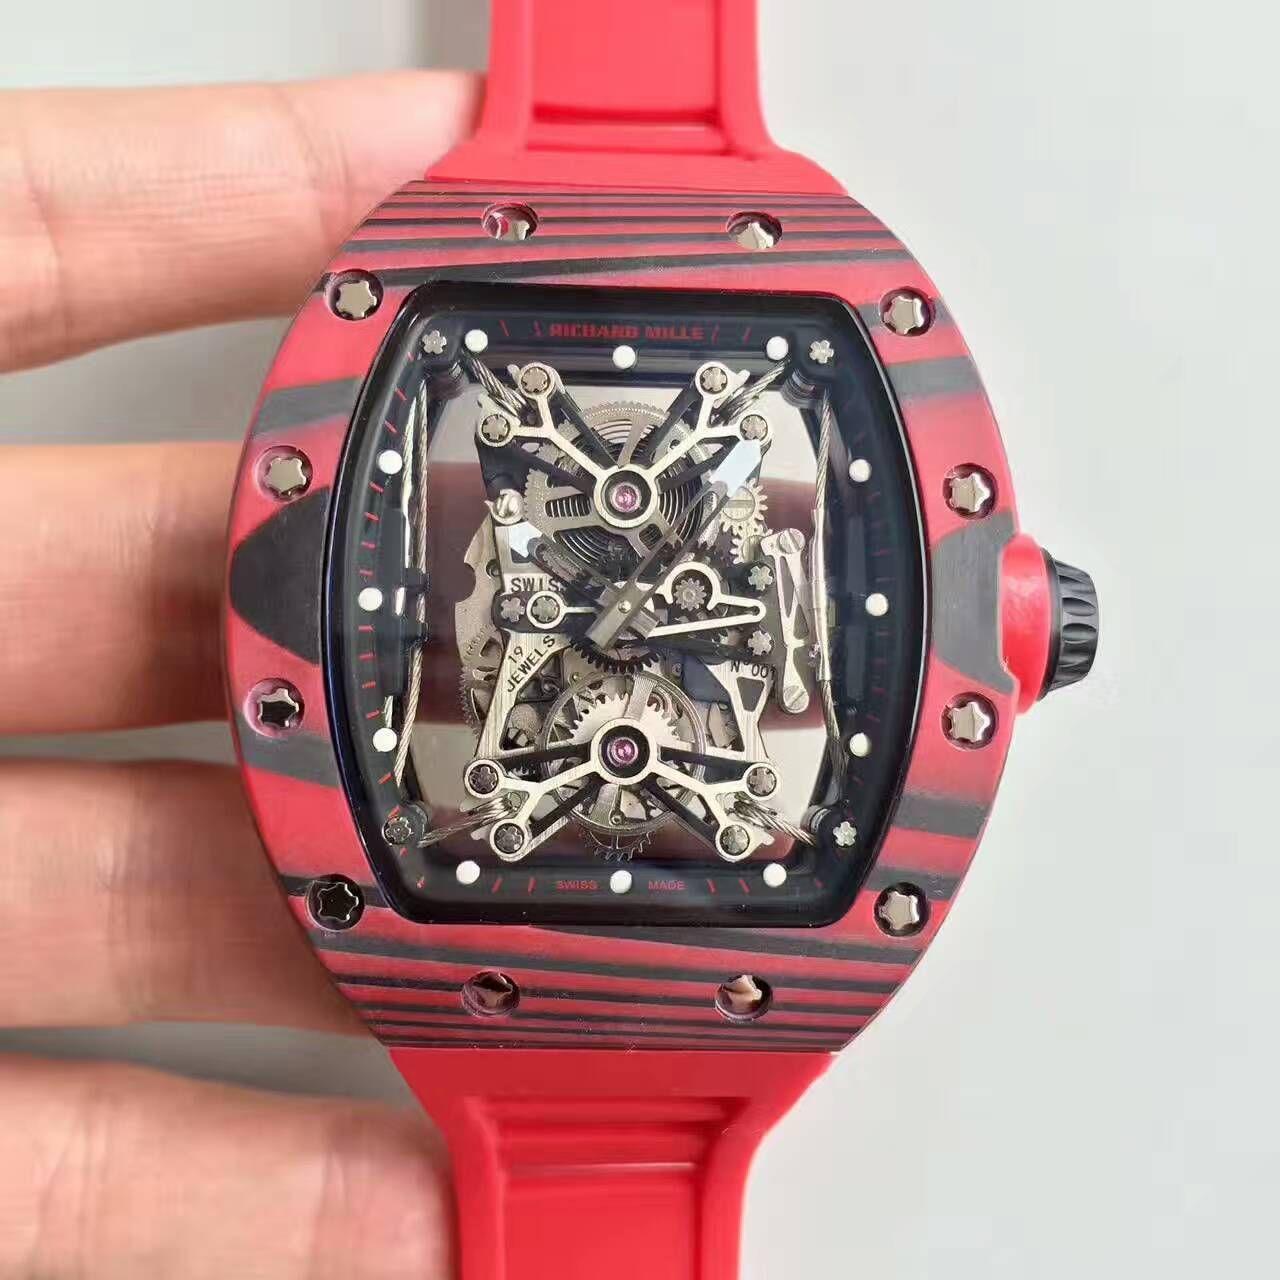 【RM厂一比一精仿手表】里查德米尔男士系列RM 50-27-01 NTPT腕表